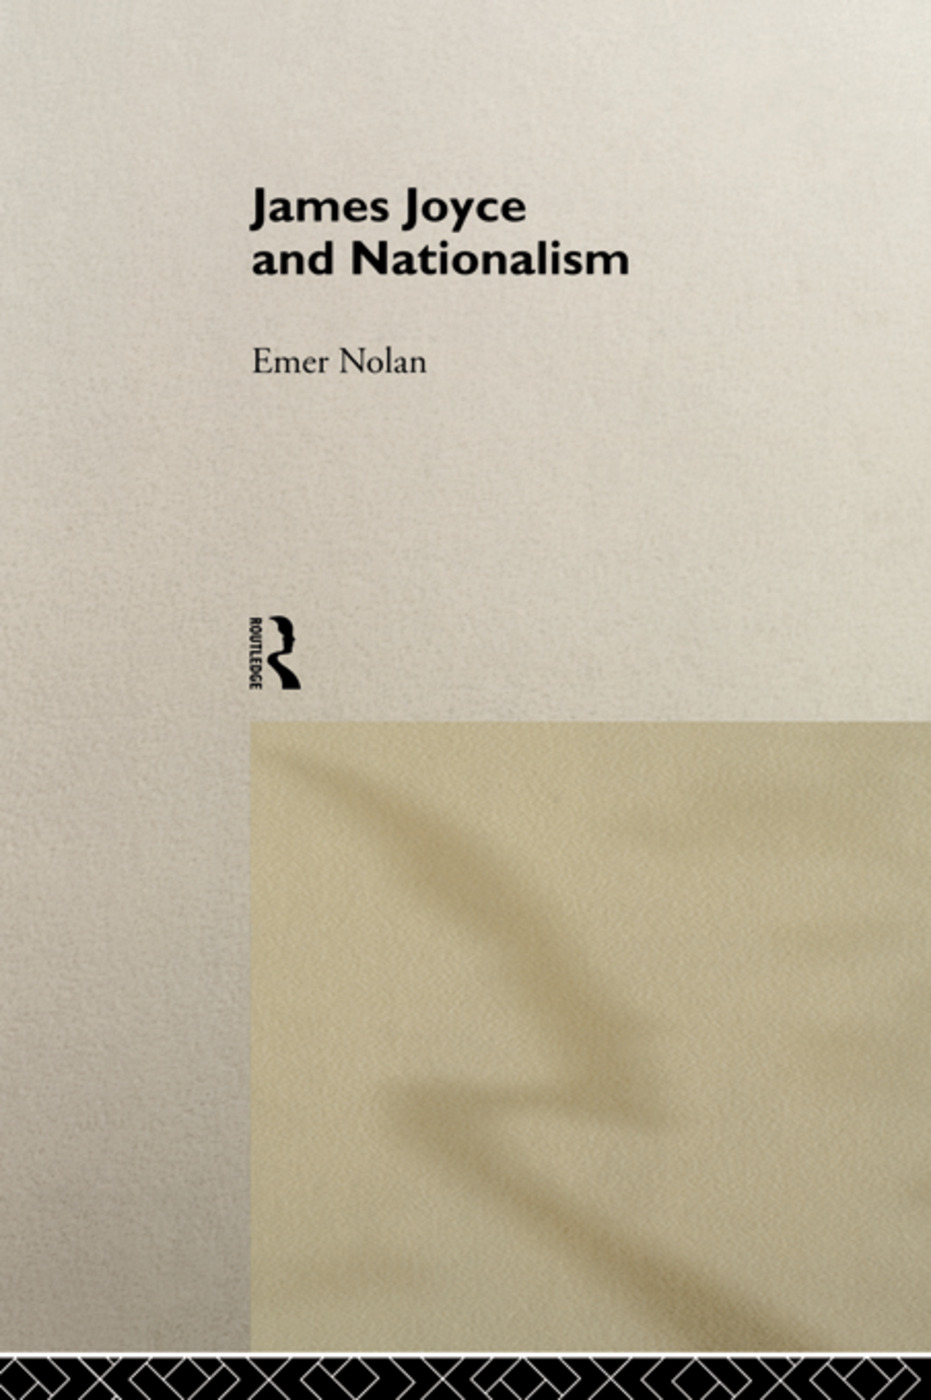 James Joyce and Nationalism